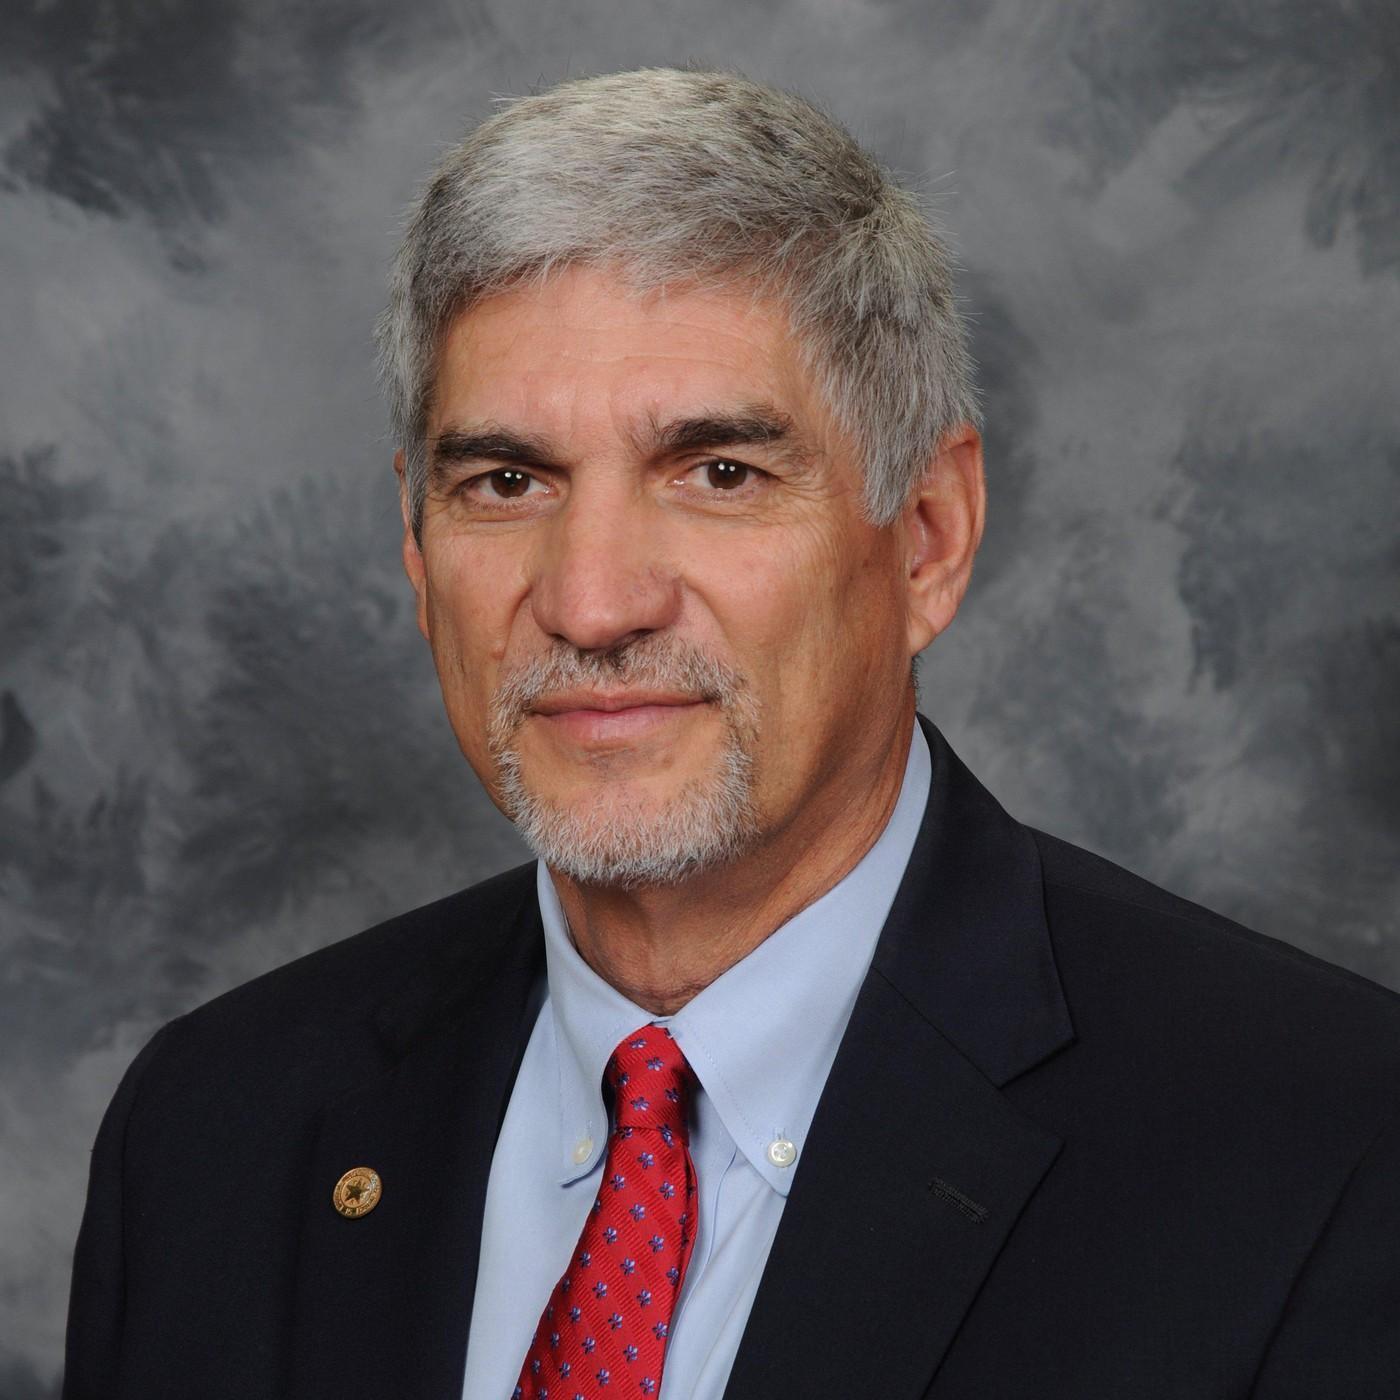 Magnolia ISD Superintendent Dr. Todd Stephens